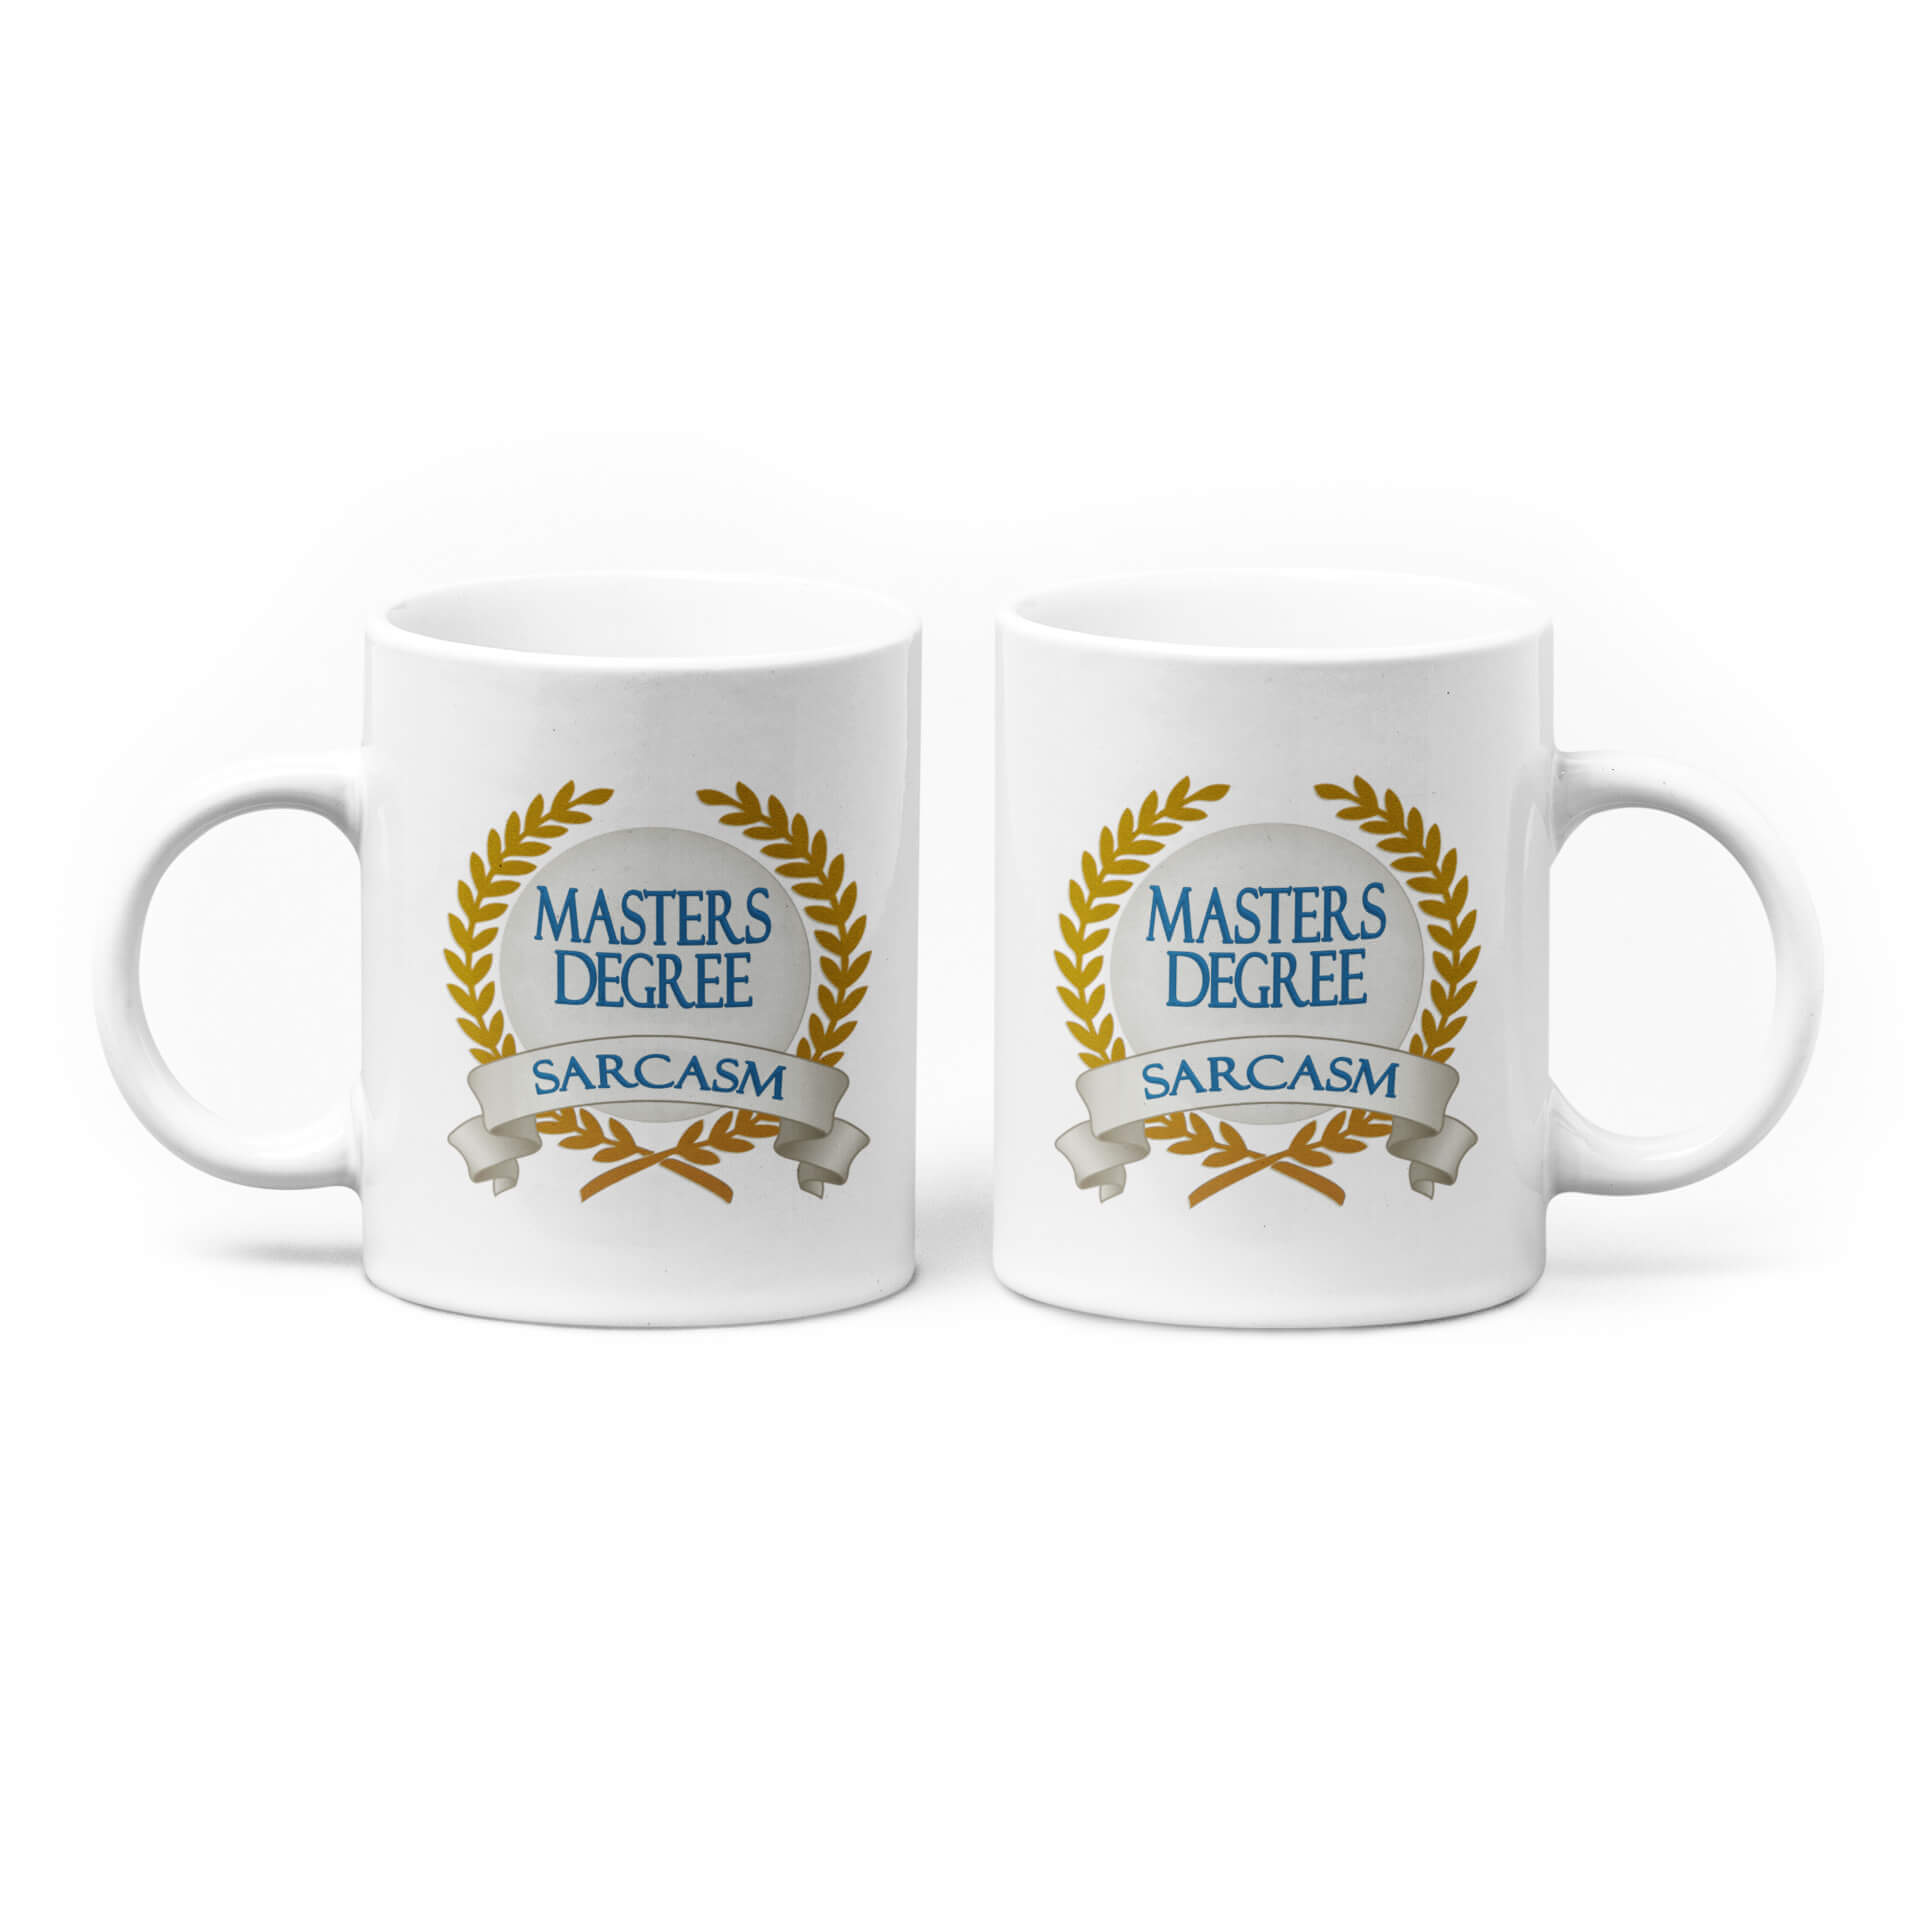 Masters Degree in Sarcasm Mug